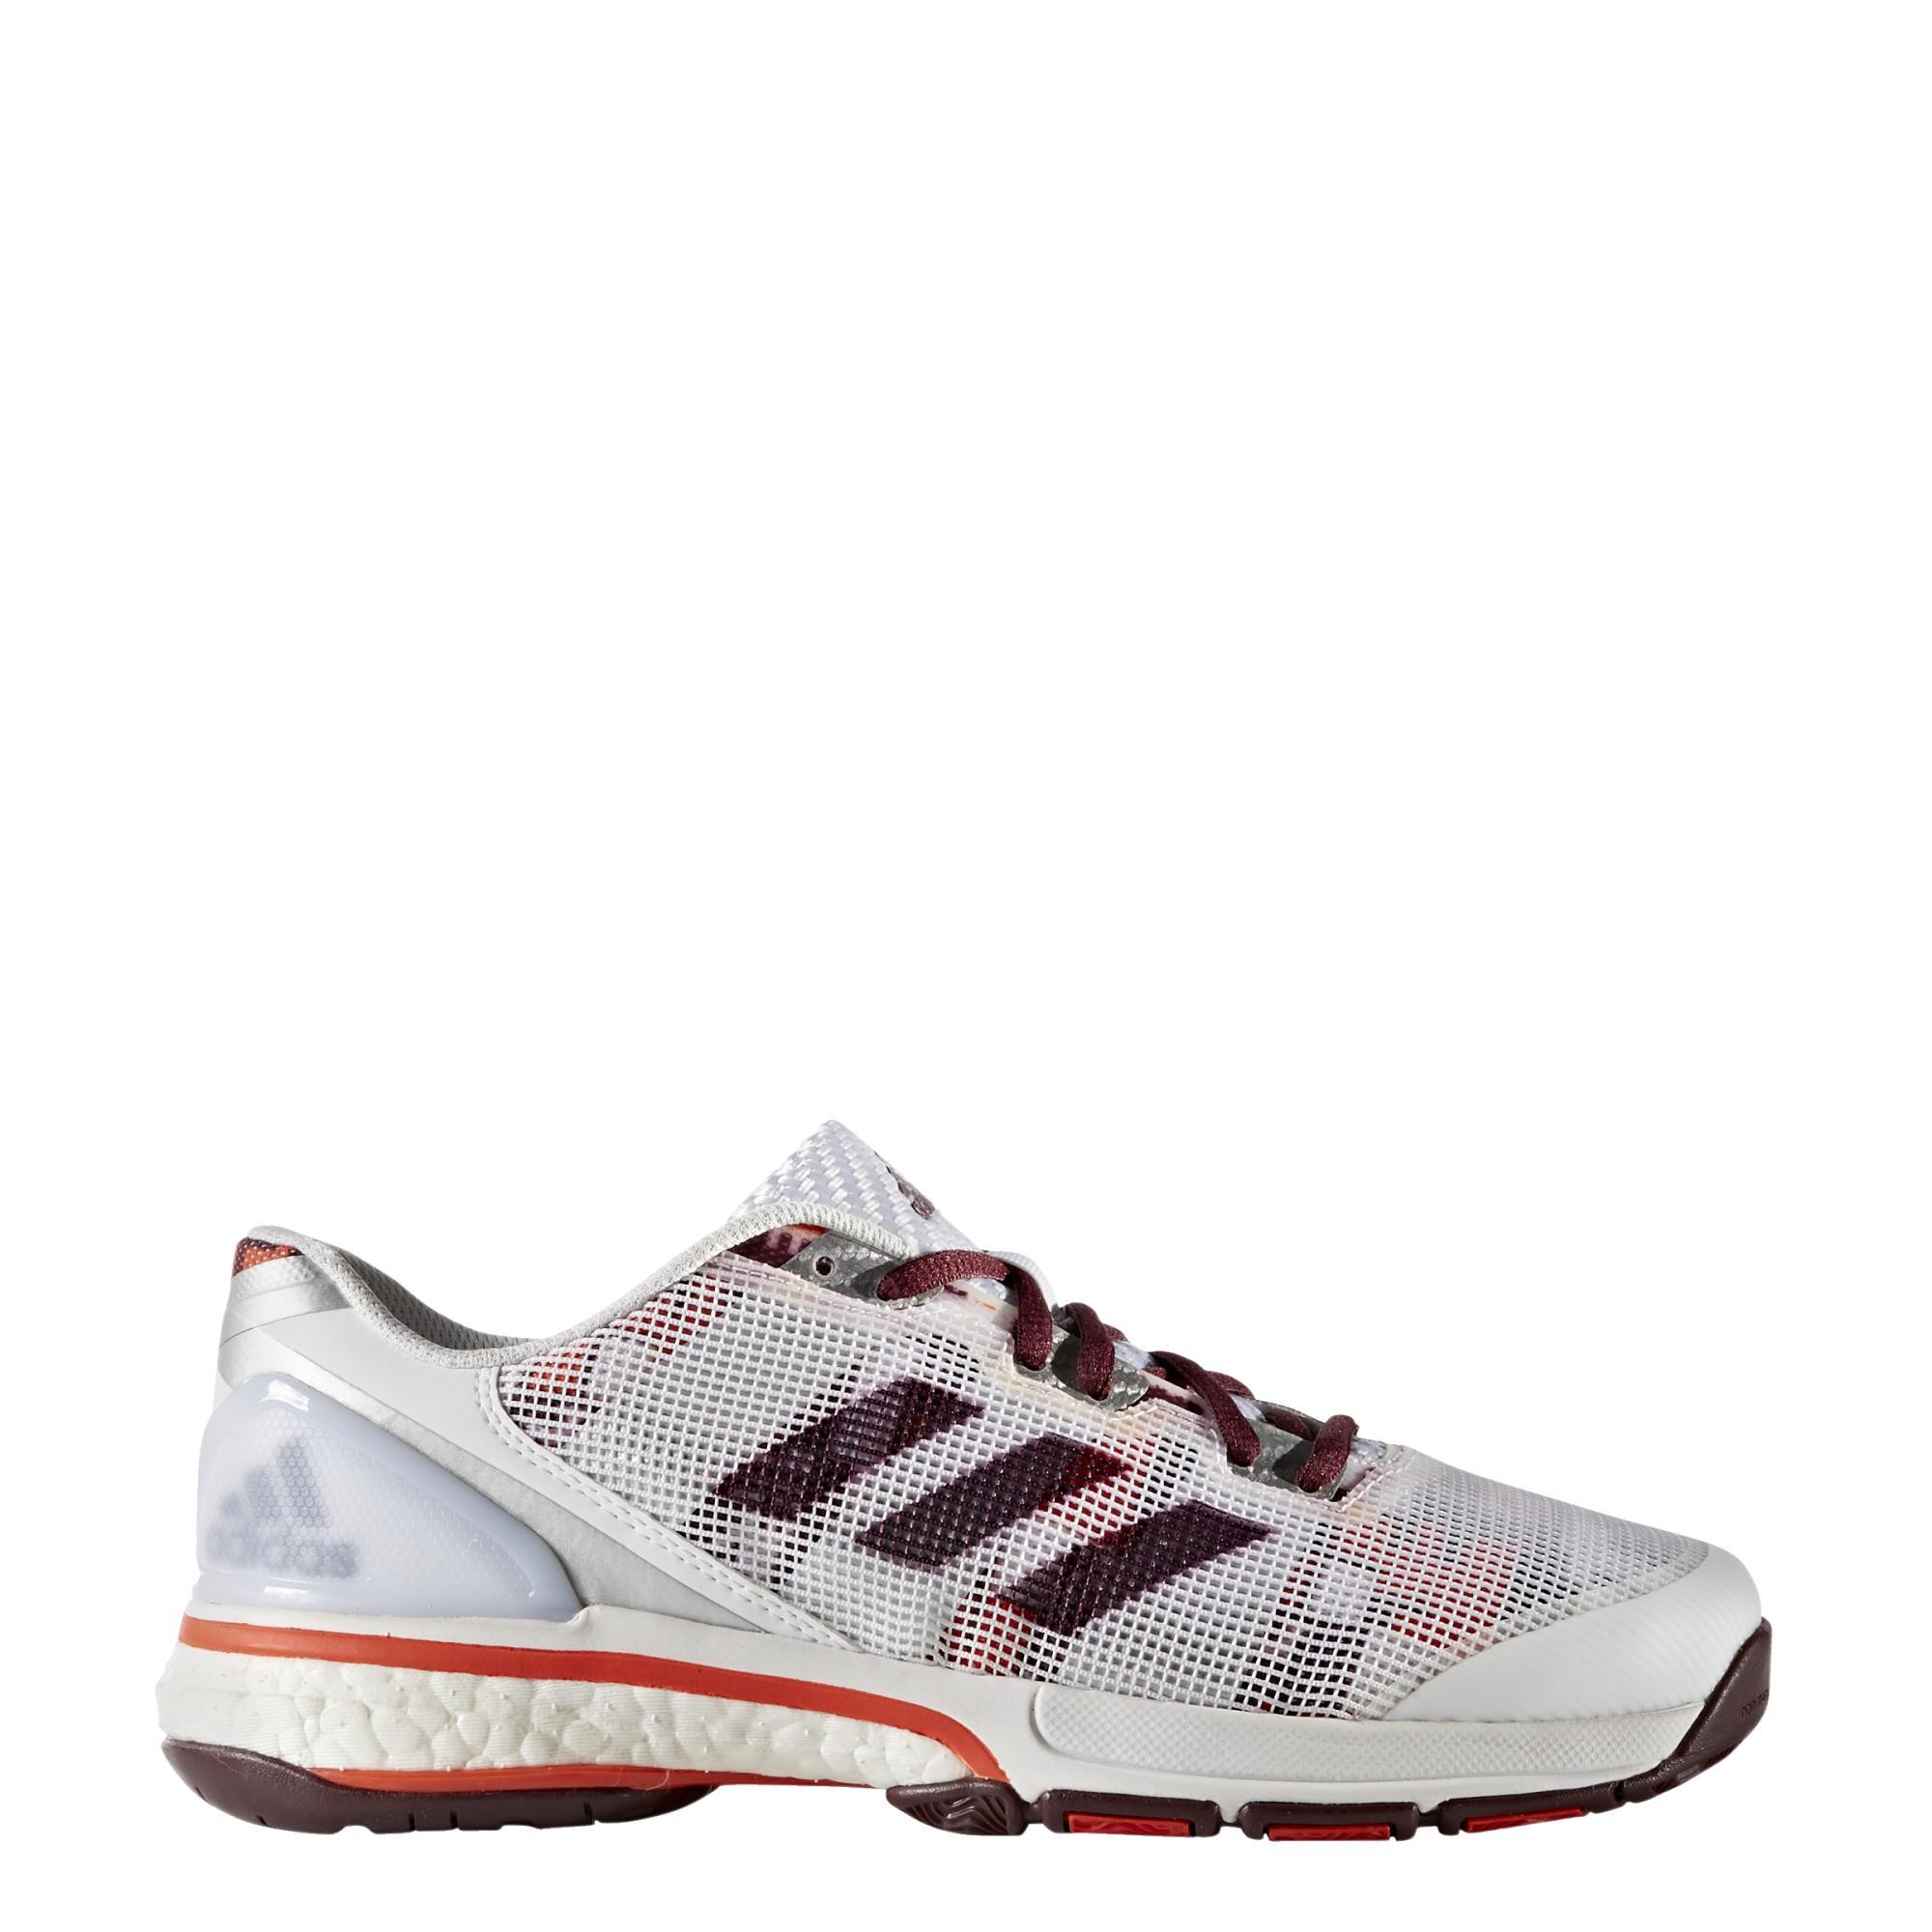 33afd2186a87b adidas Stabil Boost 20Y Shoes Women BB1820 - ambersport.pl